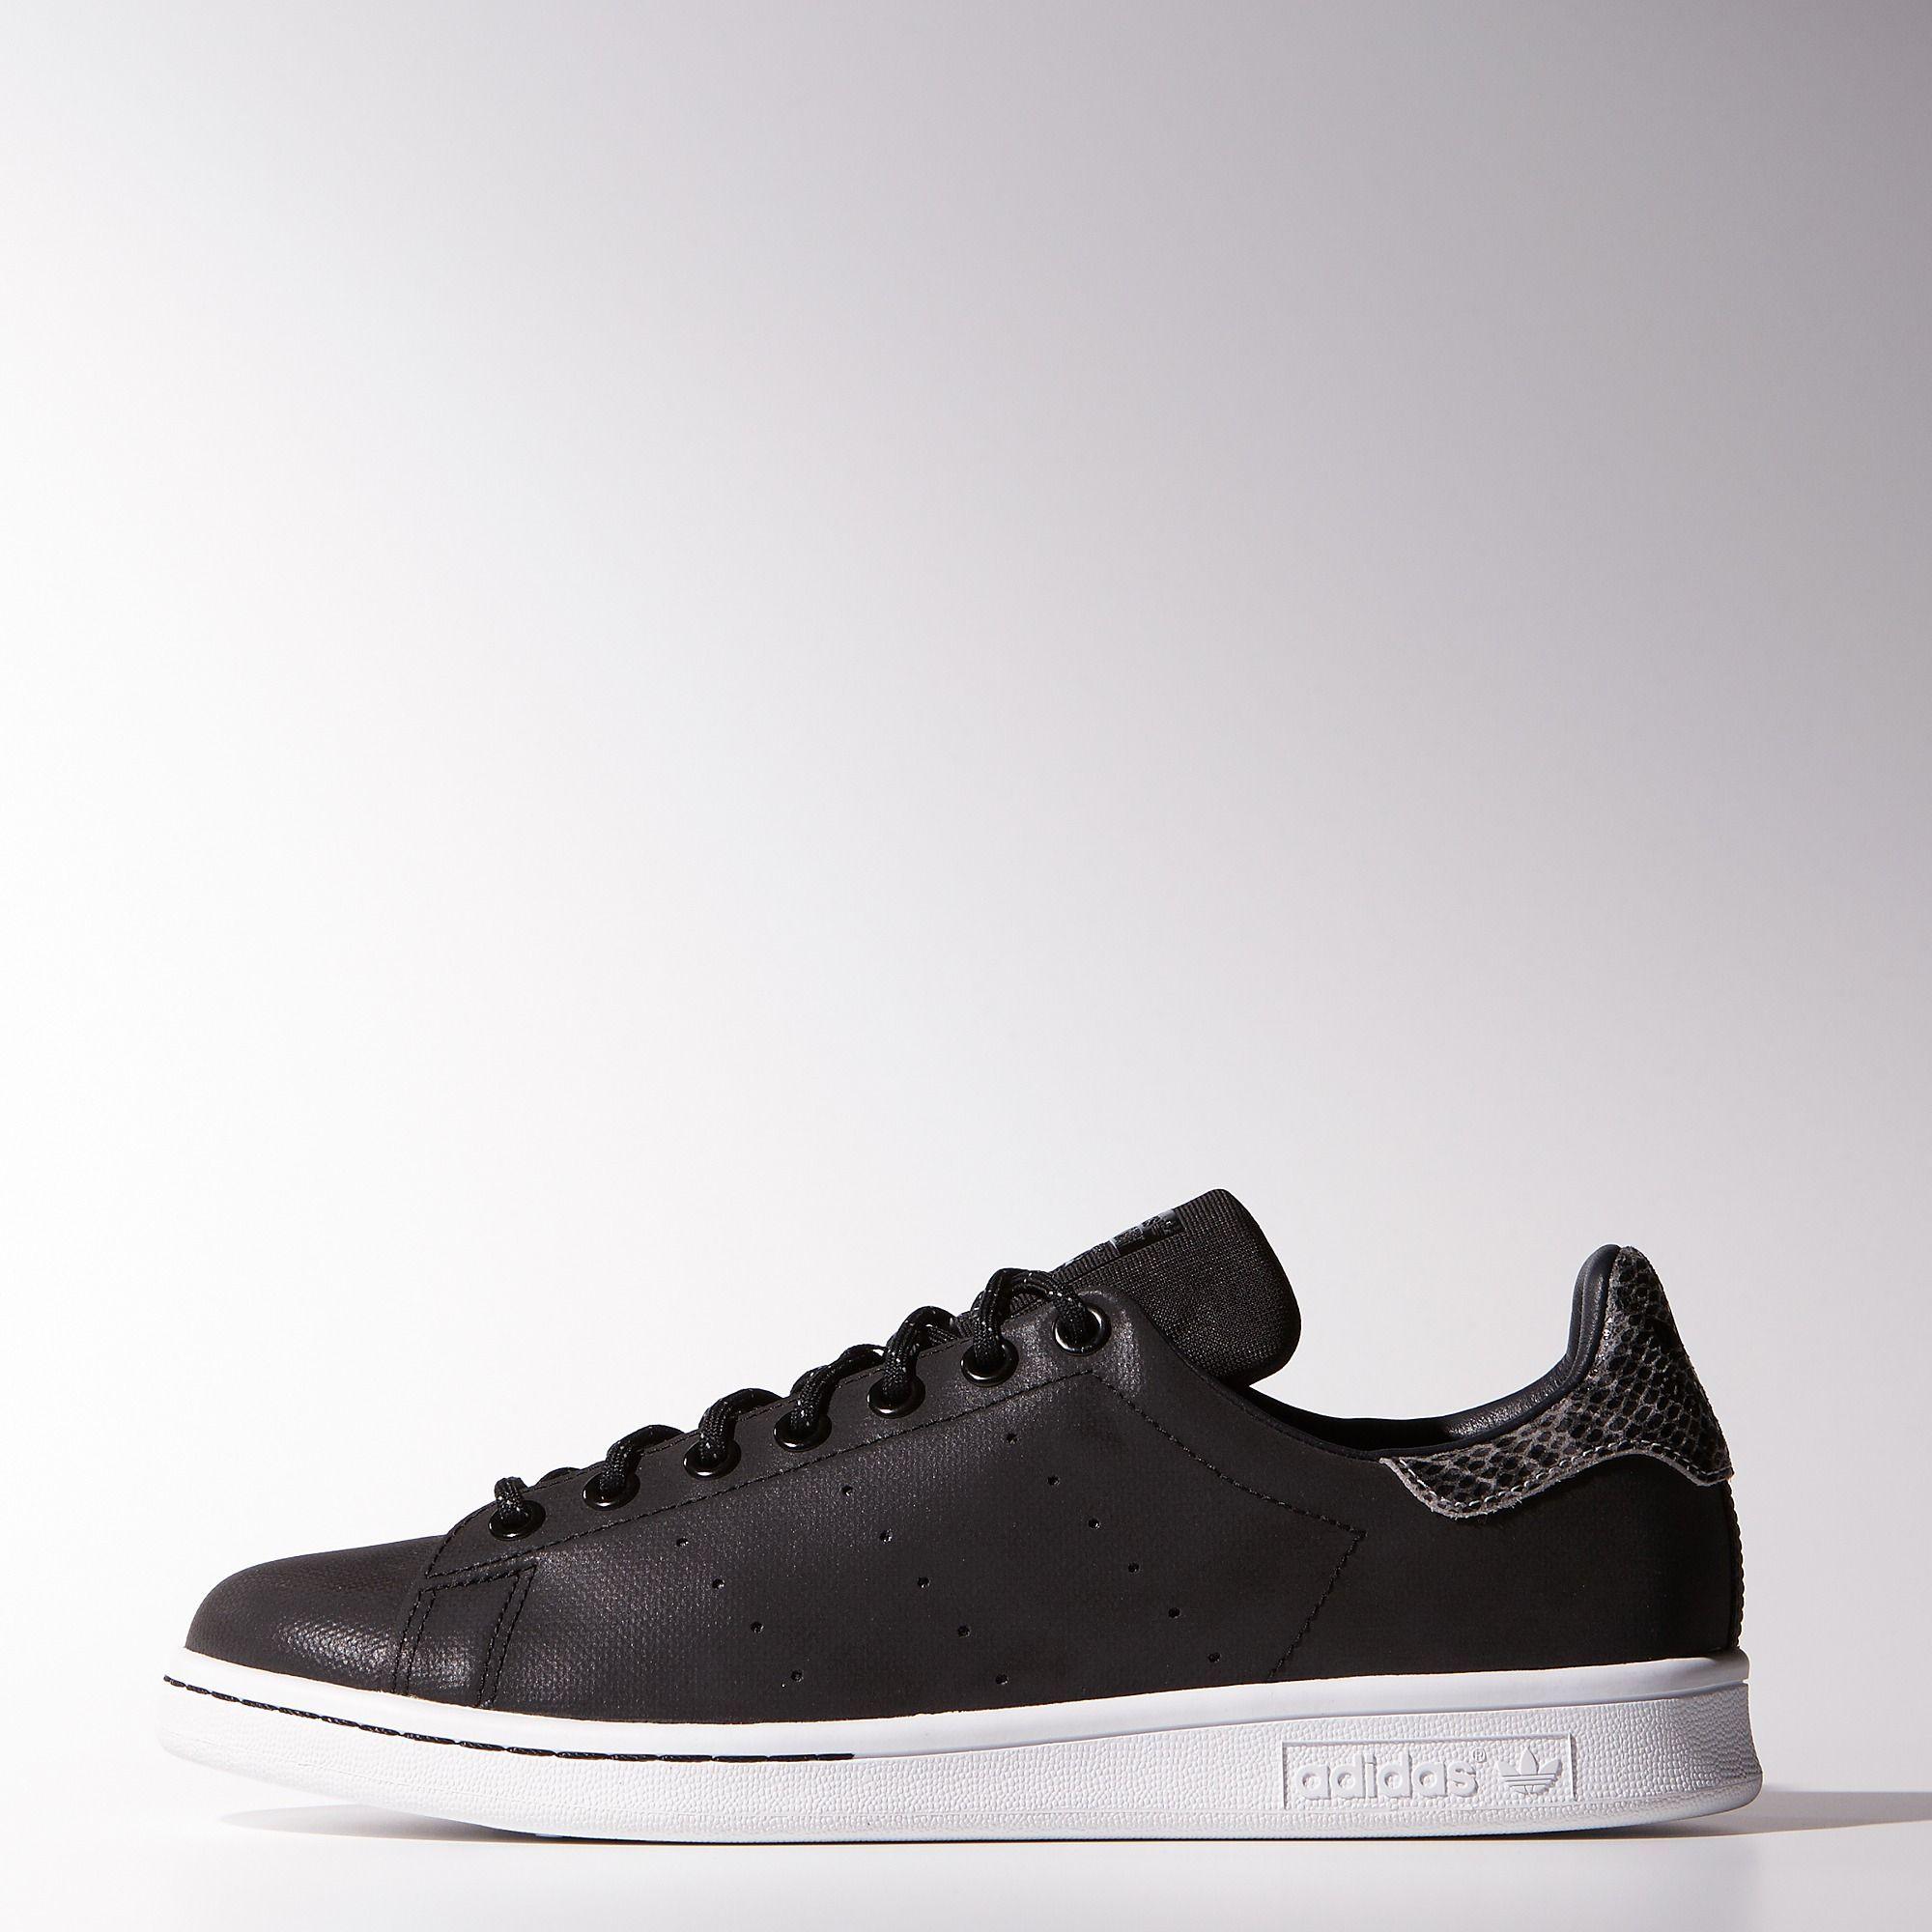 adidas stan smith wearables pinterest stan smith, nero